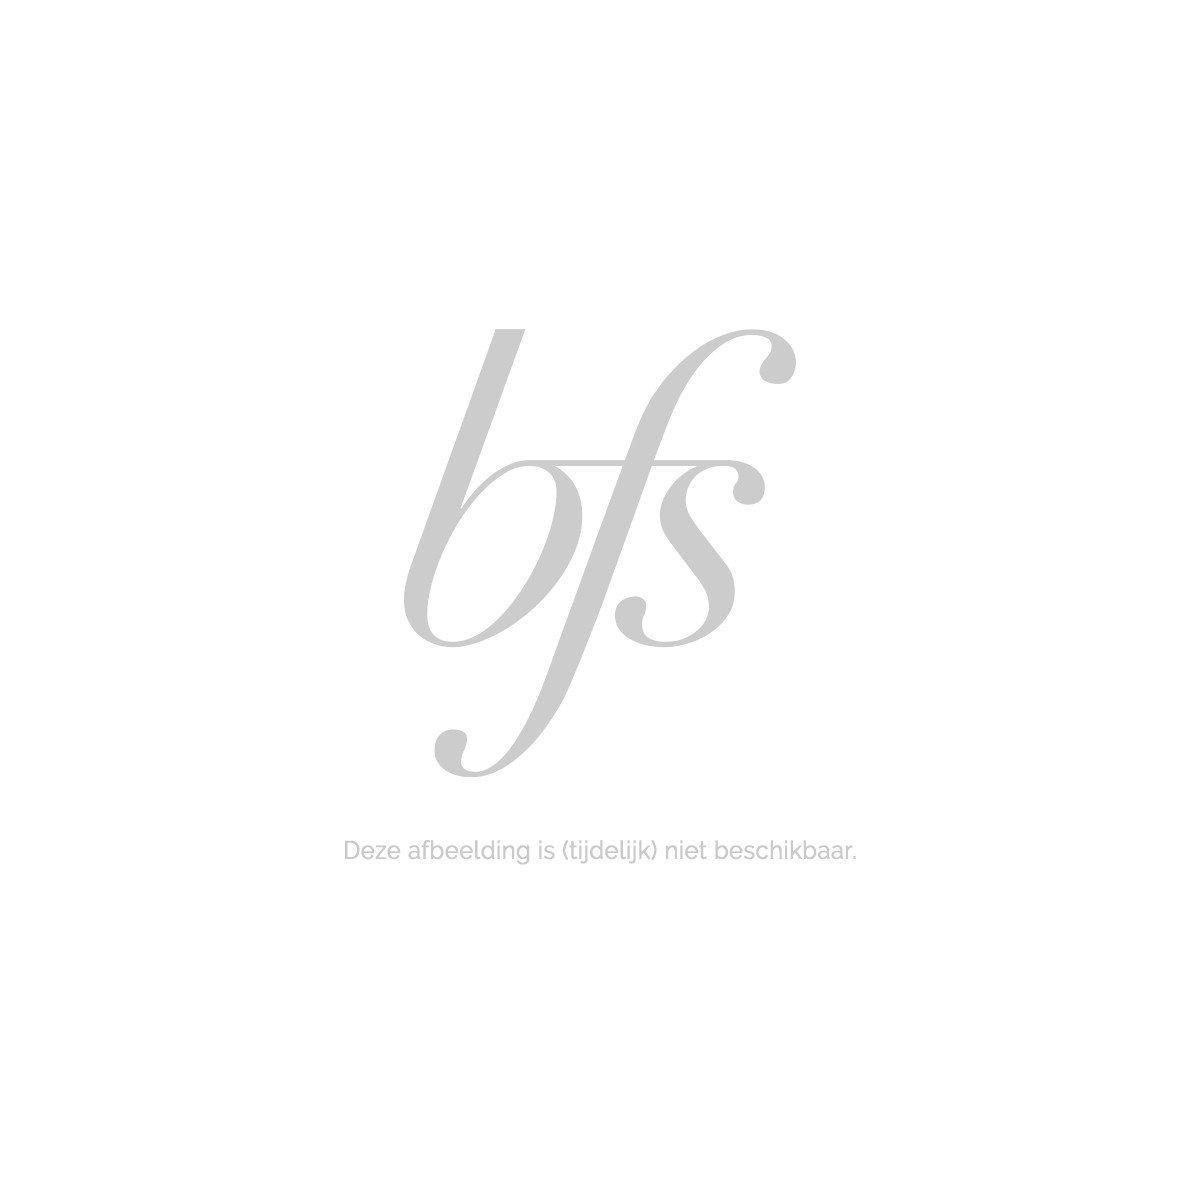 Biosilk Volumizing Therapy Conditioner-15Ml